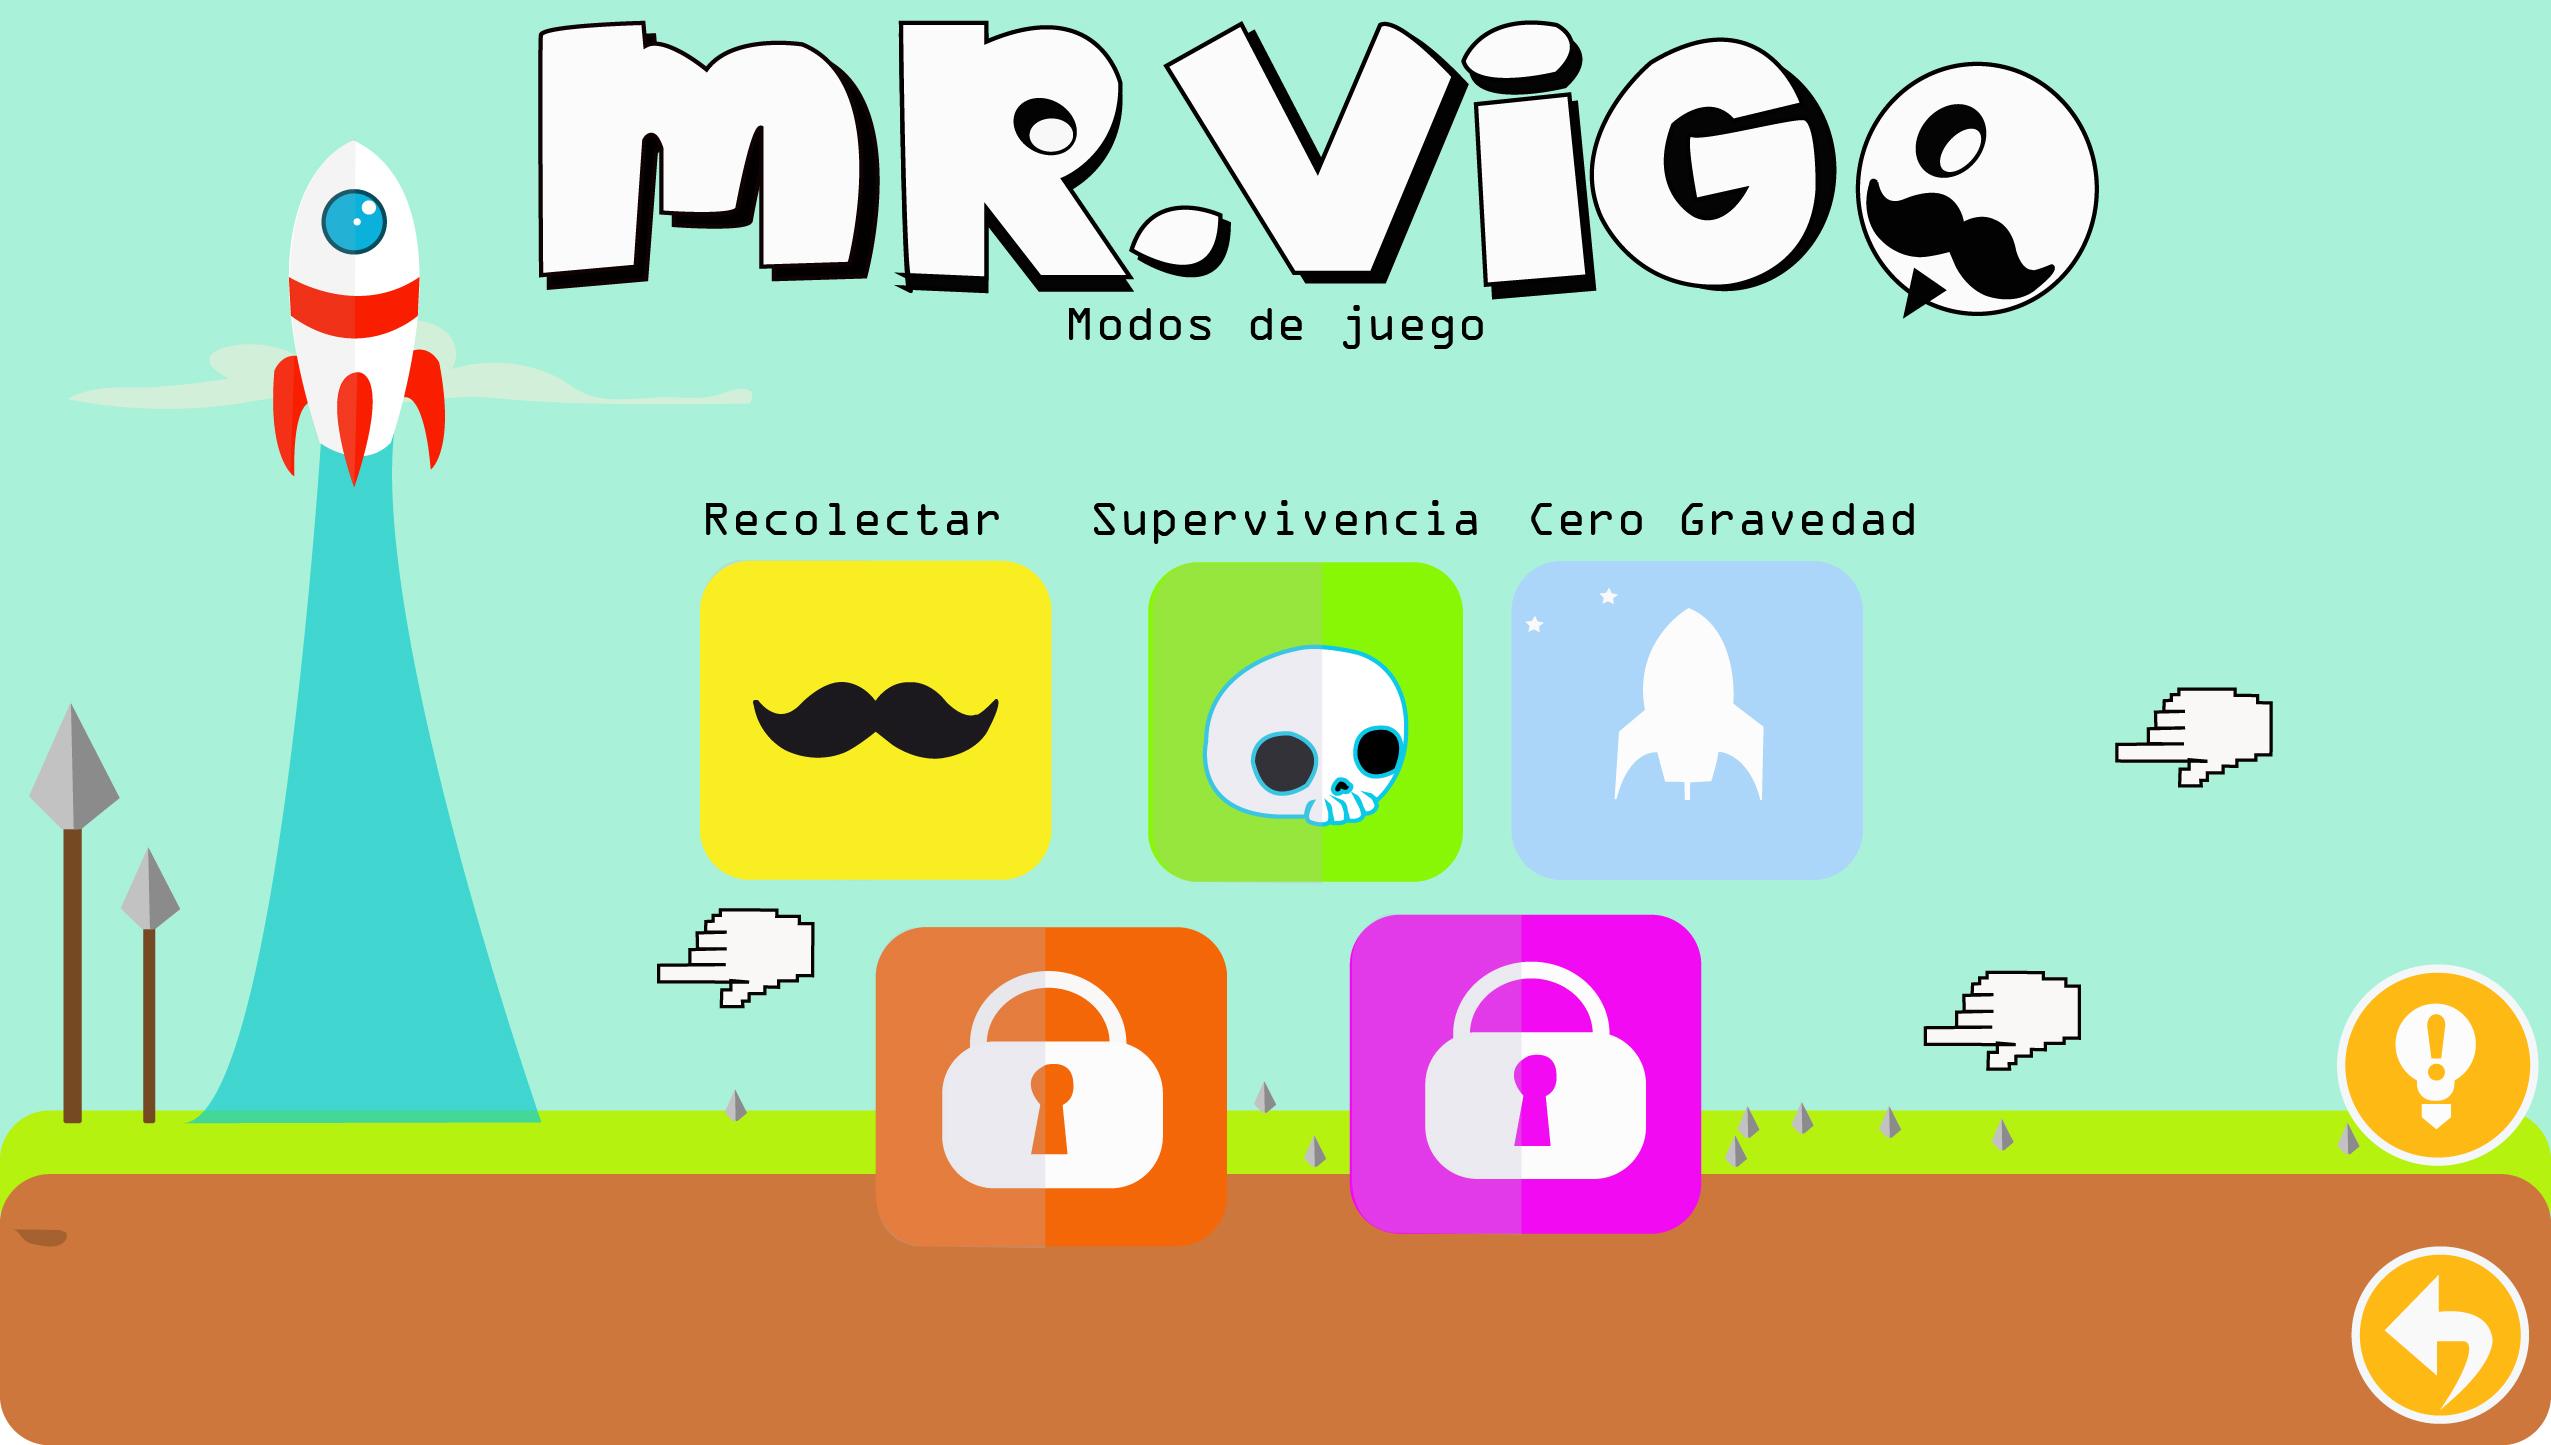 Mr. Vigo